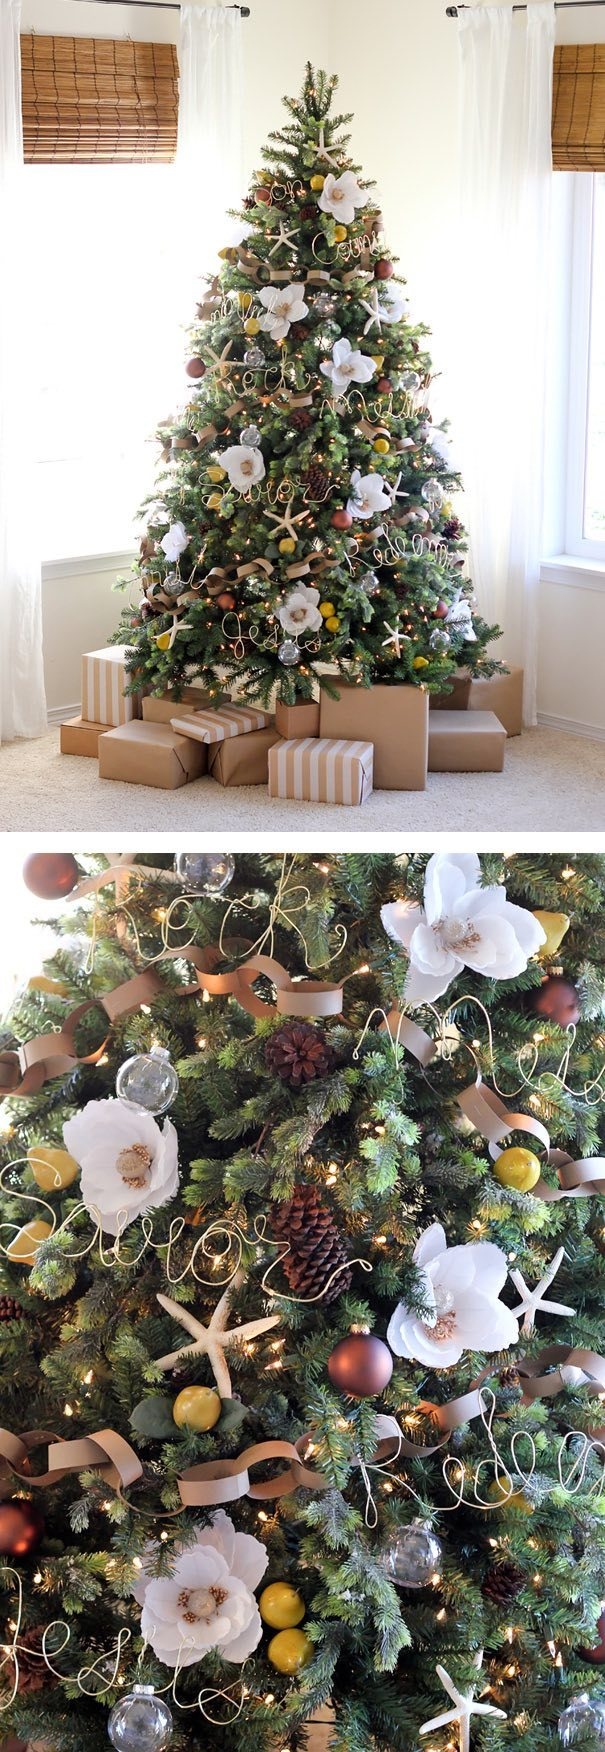 Božićna drvca - Page 4 Tumblr_nzmn3iydQr1s59yrco3_1280